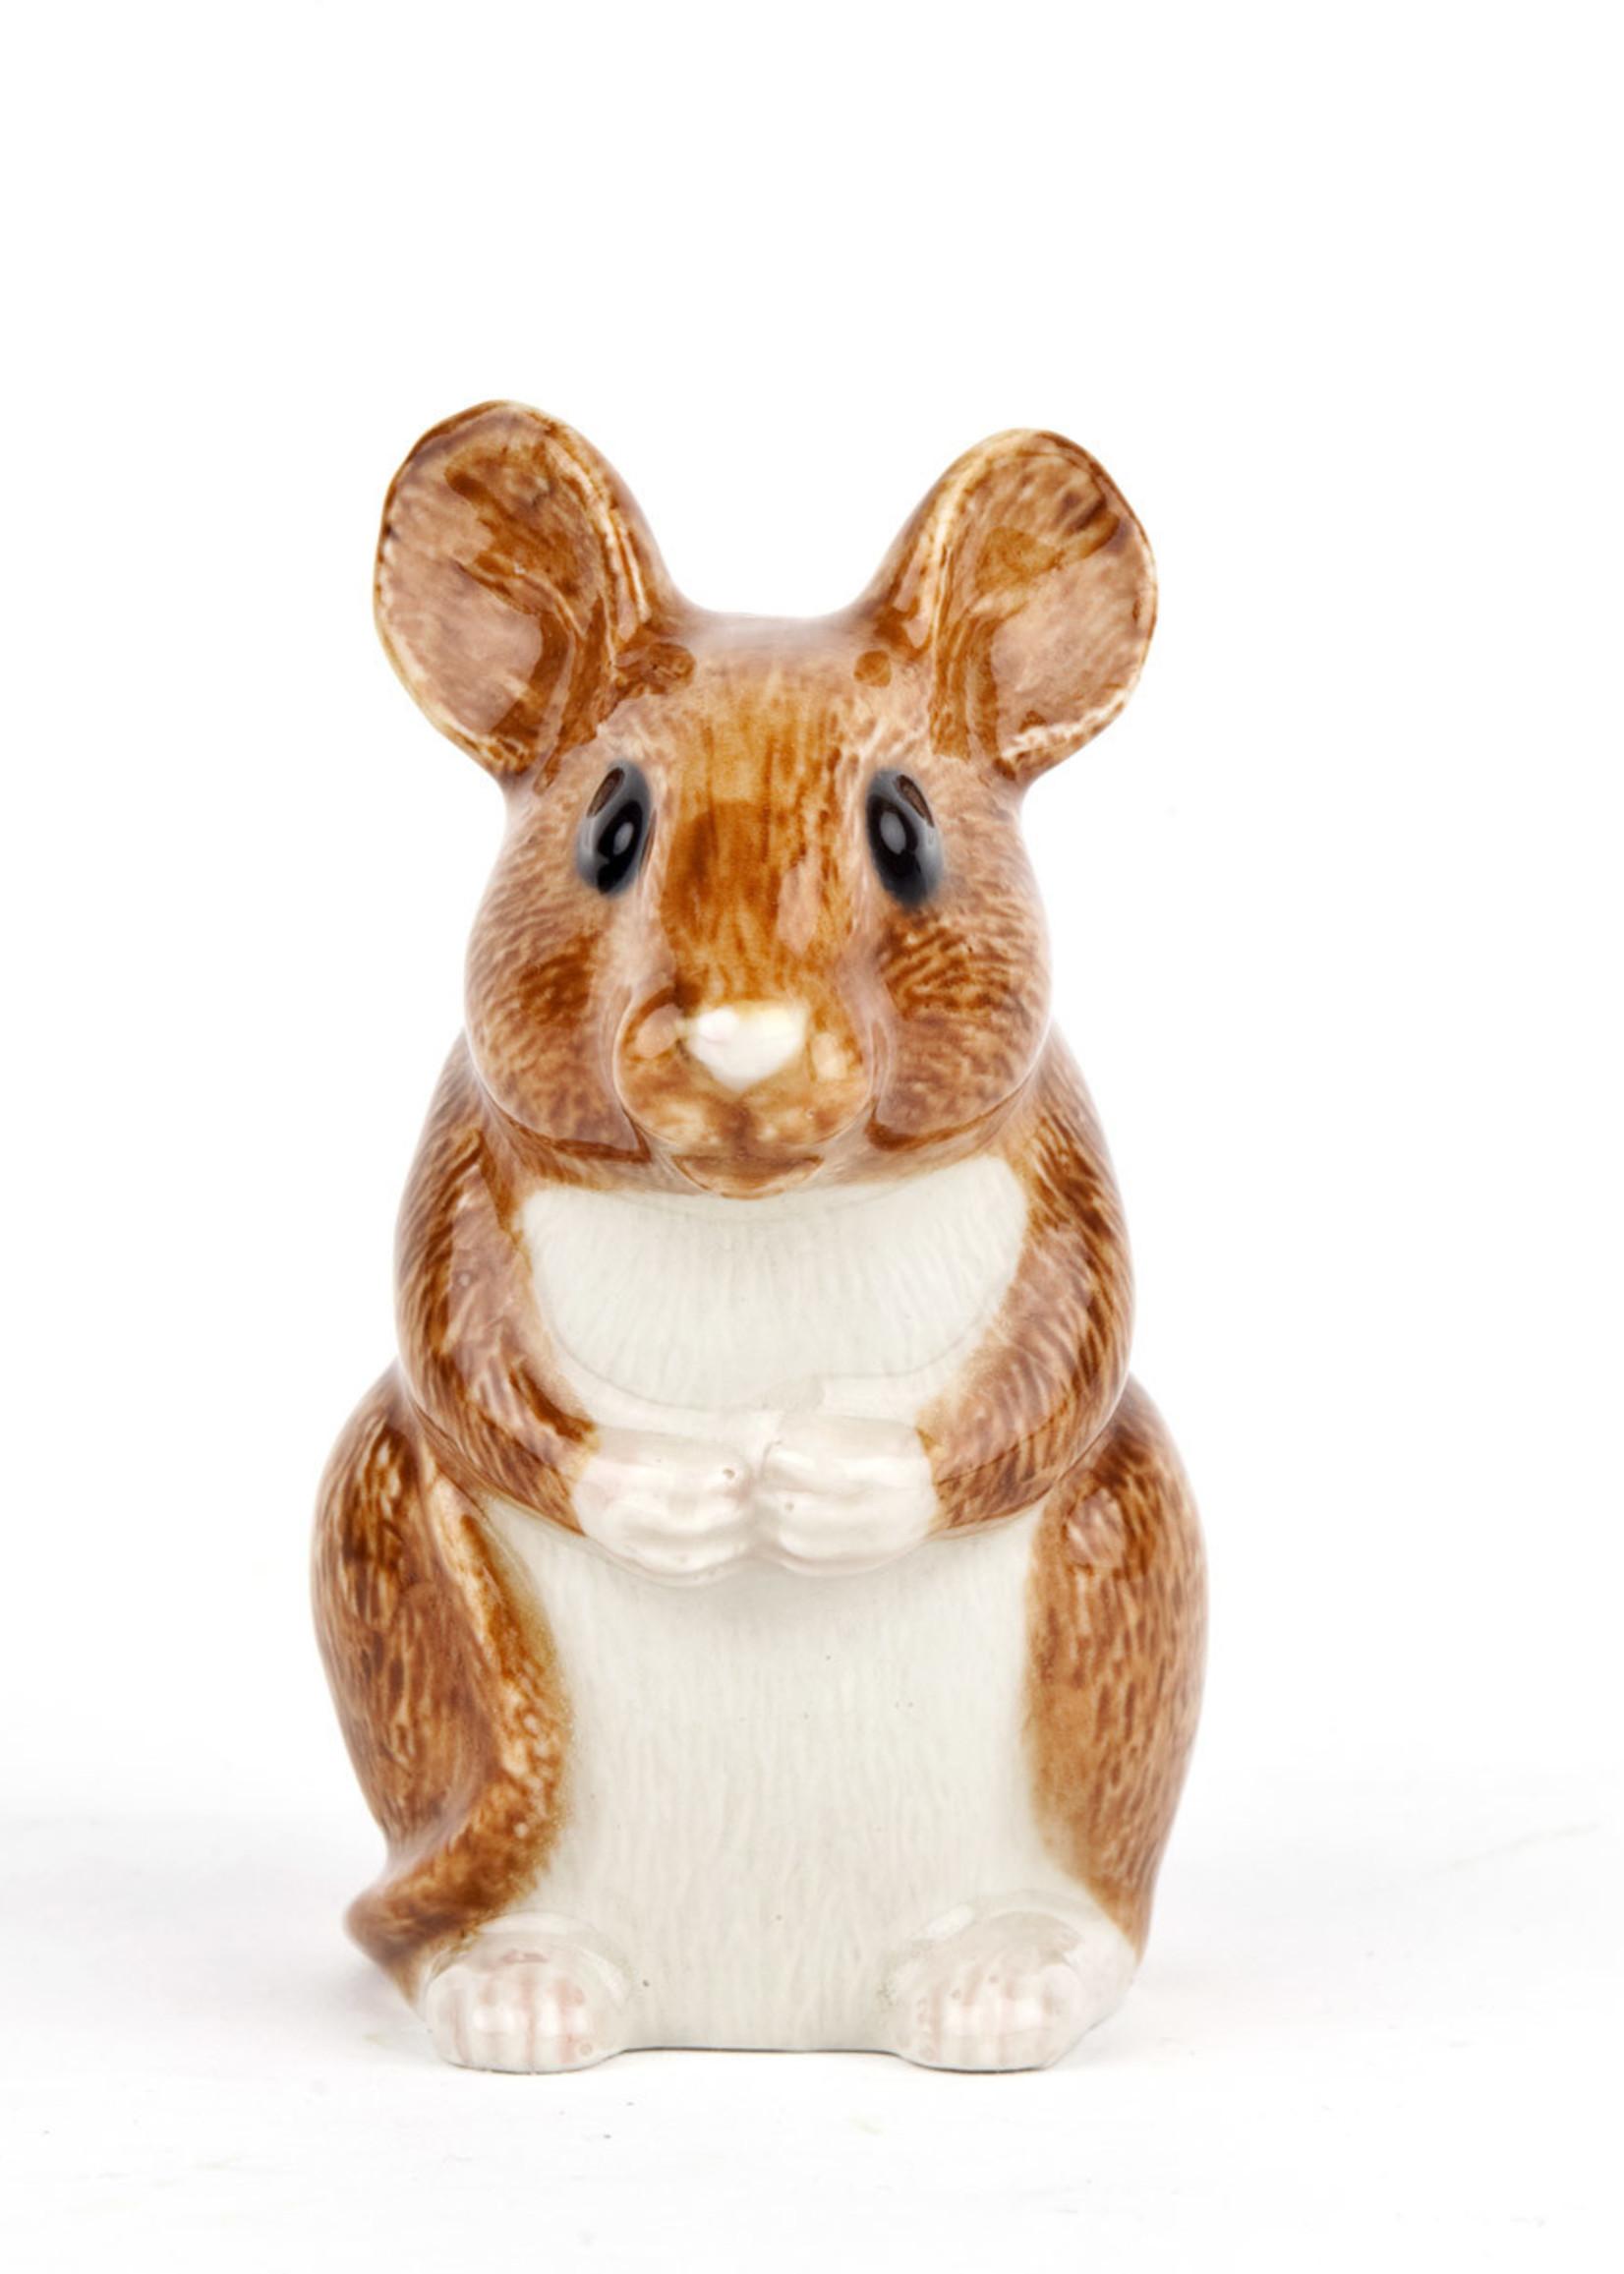 Quail Vaasje MUIS wood mouse